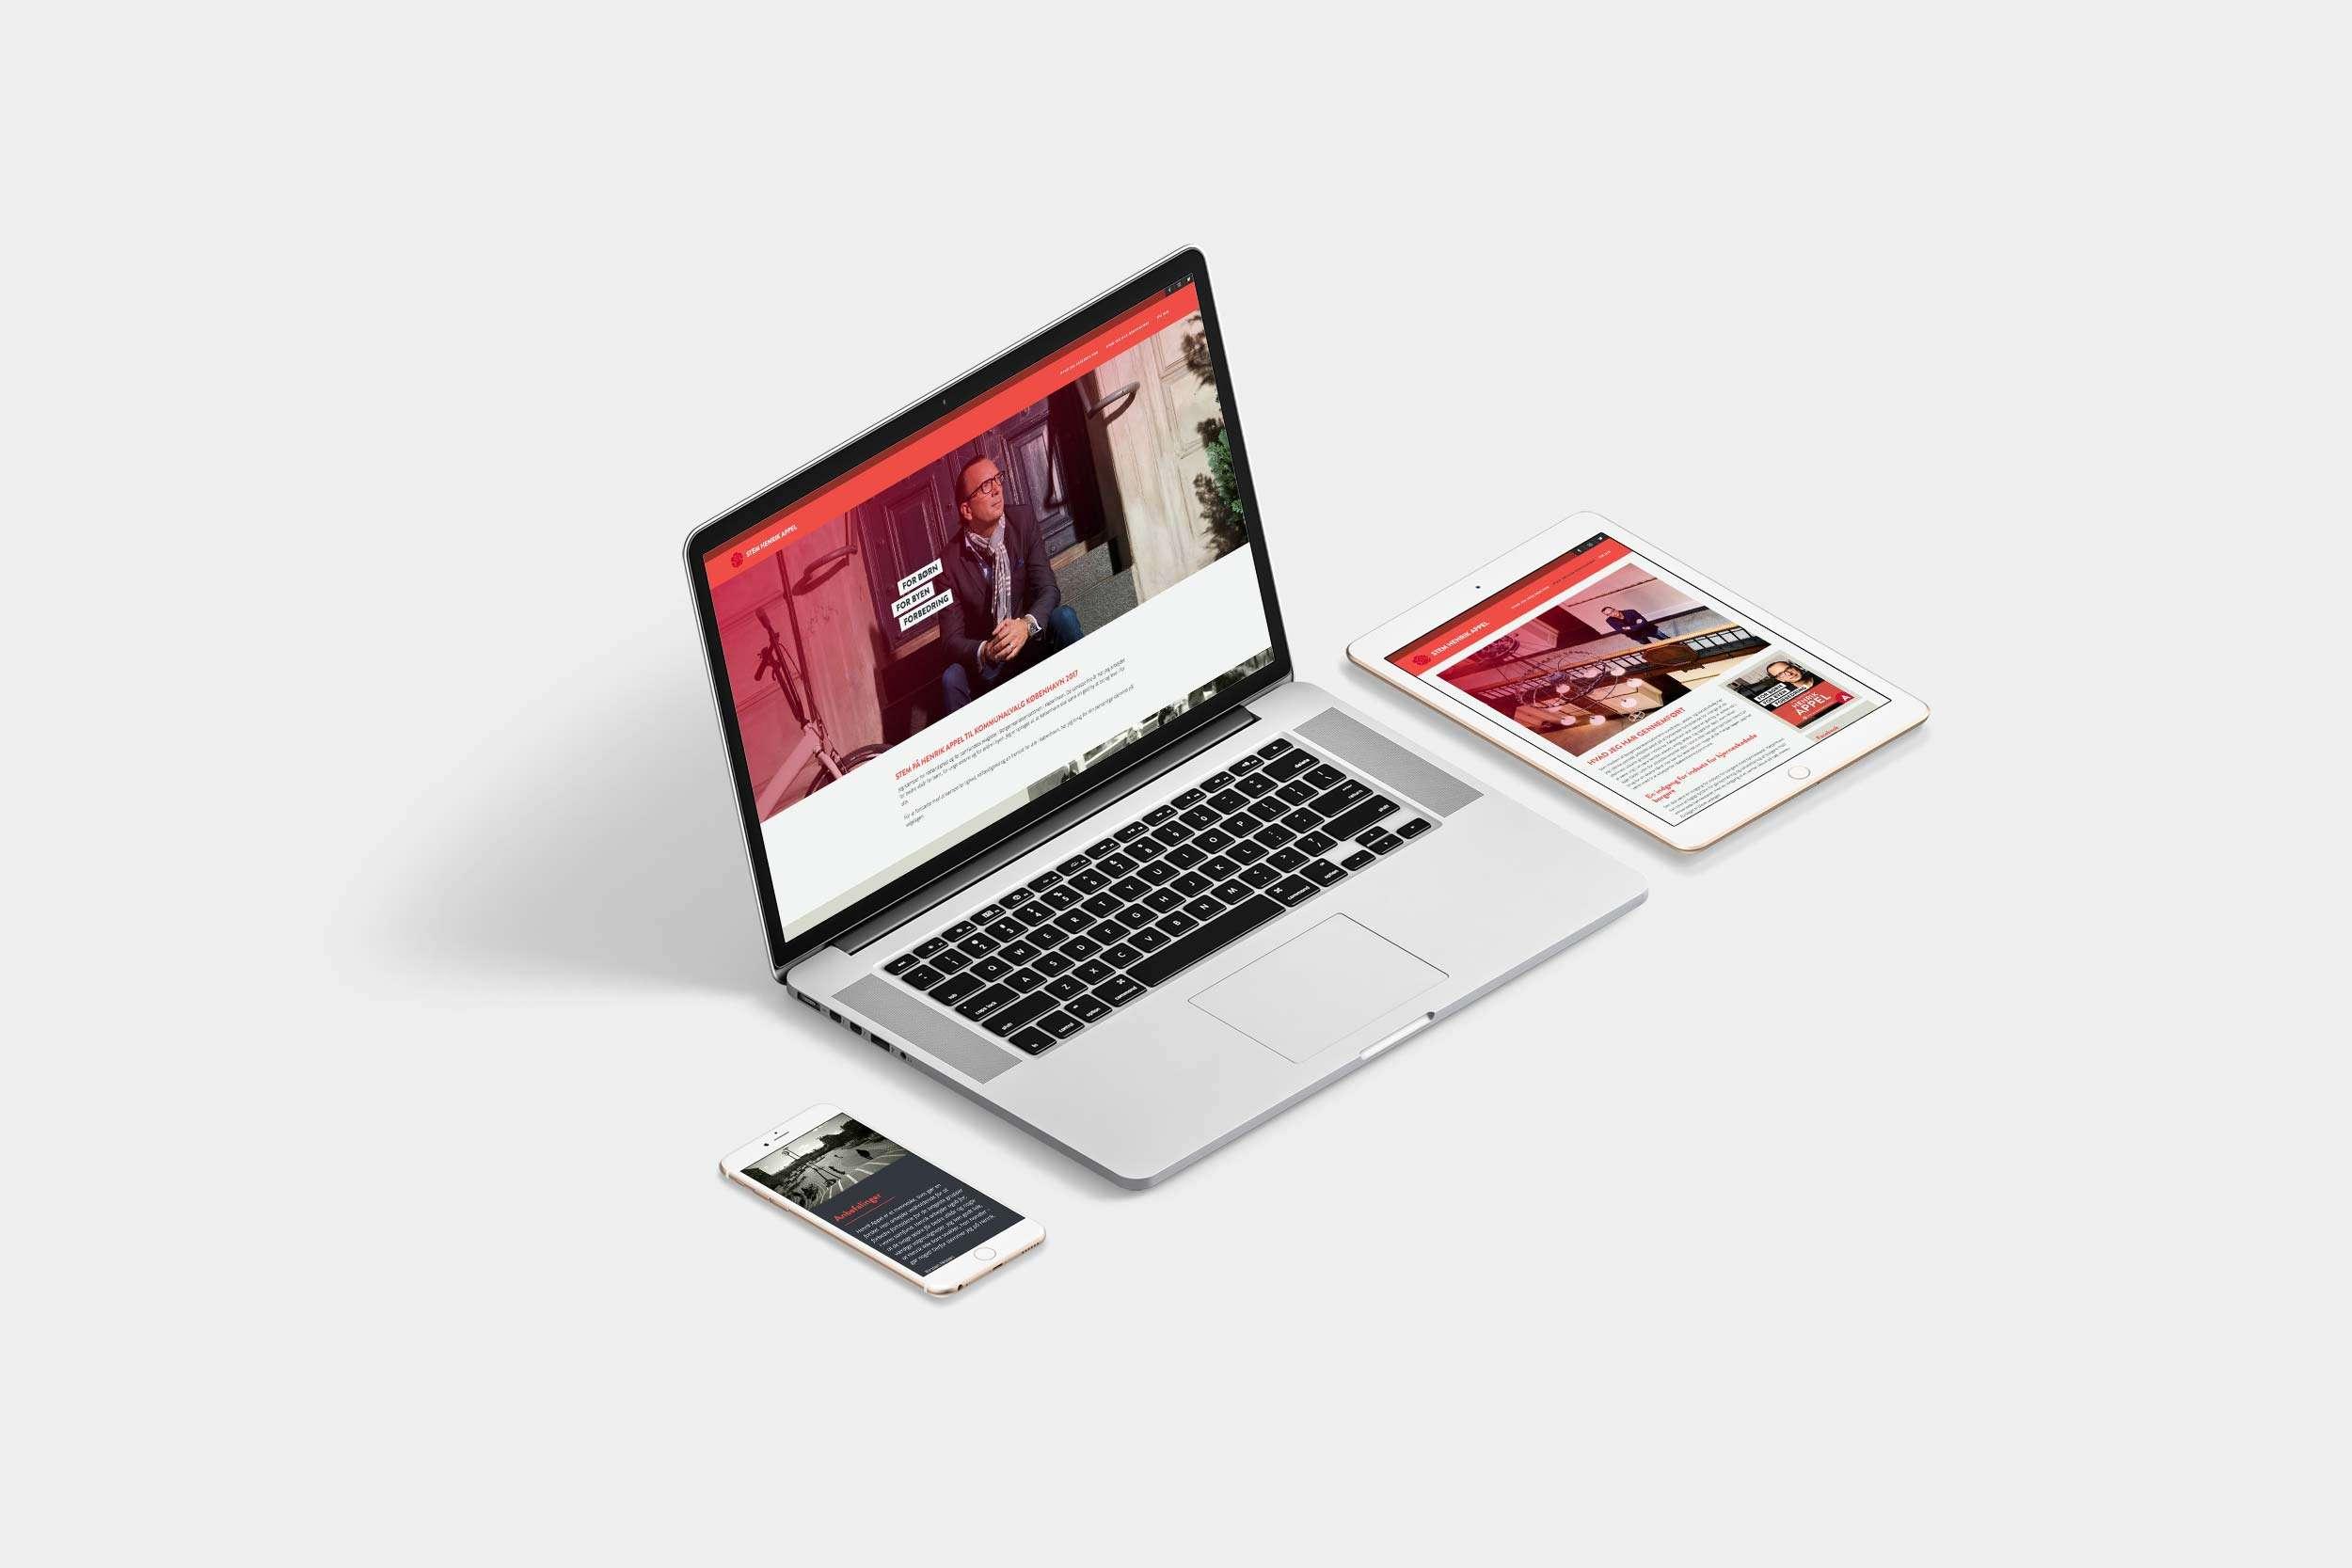 Stem Henrik Appel, laptop, ipad and iphone